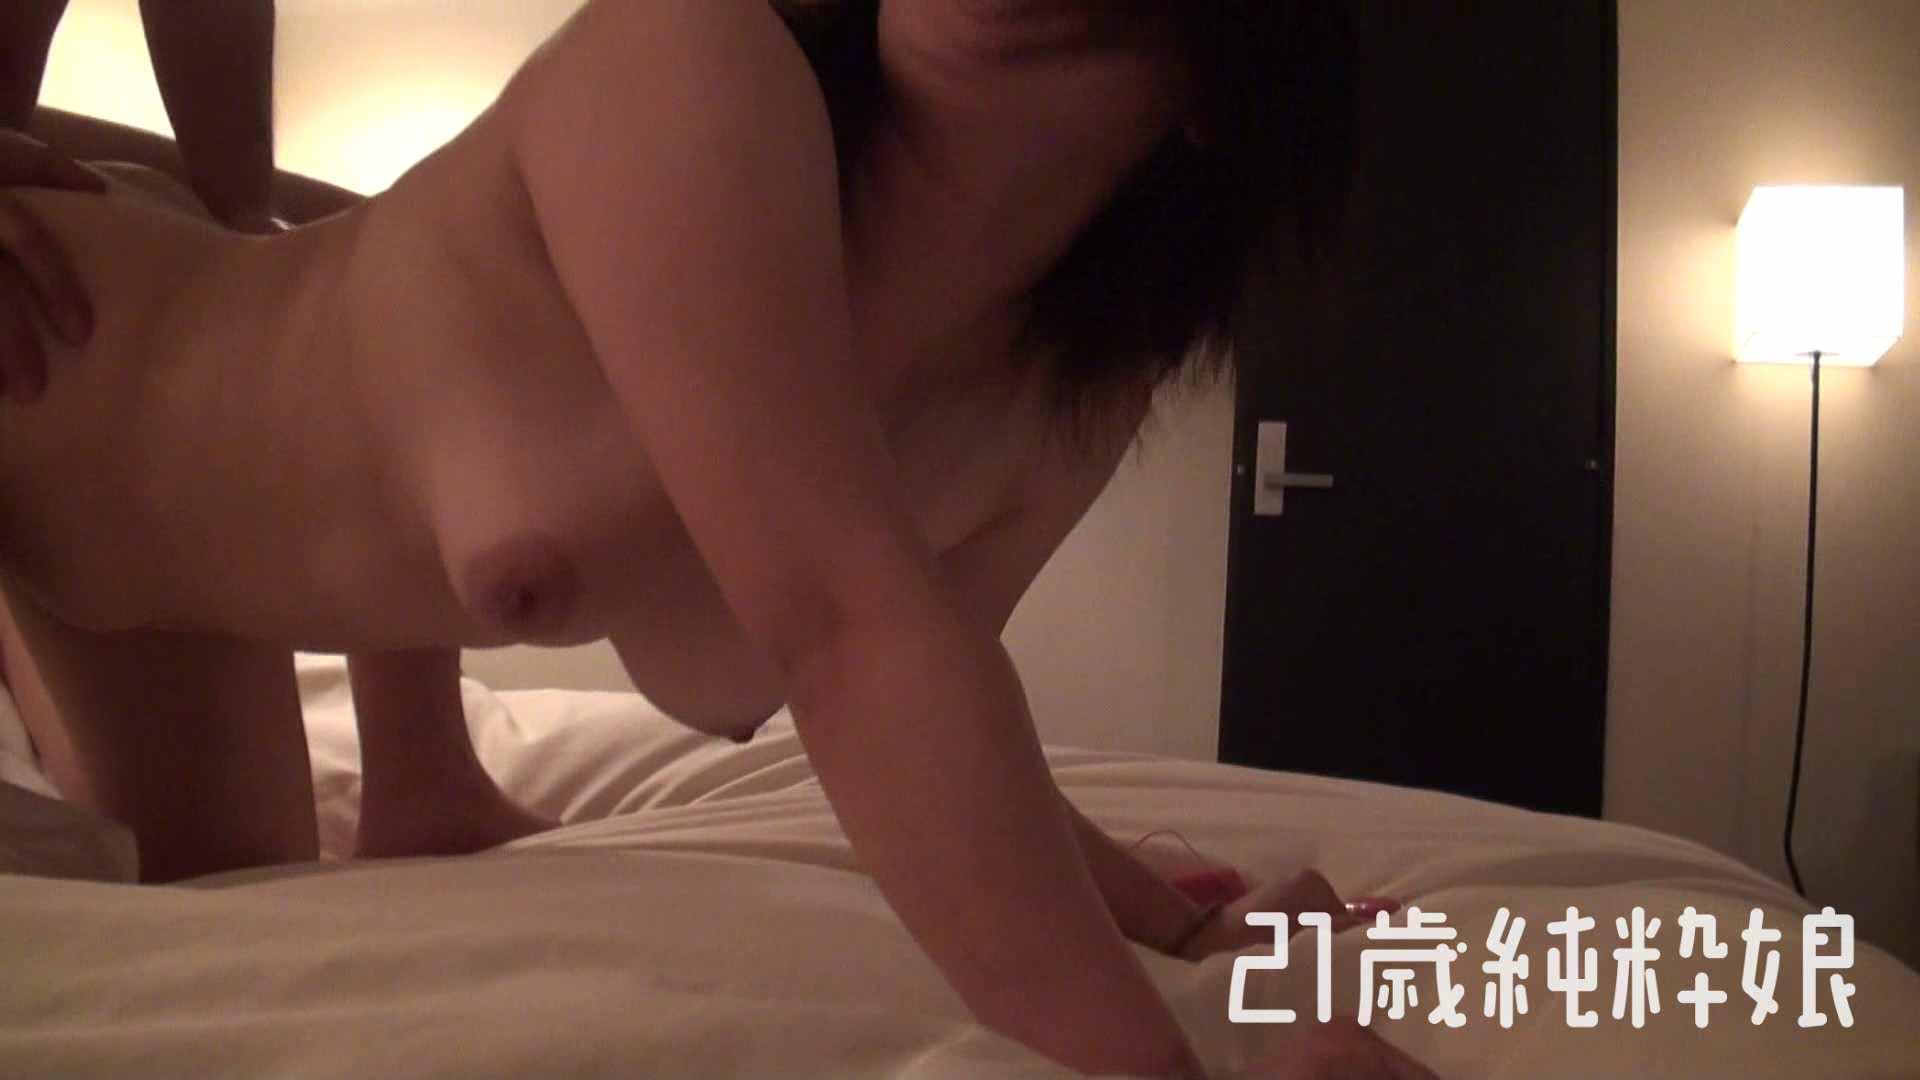 Gカップ21歳純粋嬢第2弾Vol.4 性欲 オマンコ動画キャプチャ 88連発 38